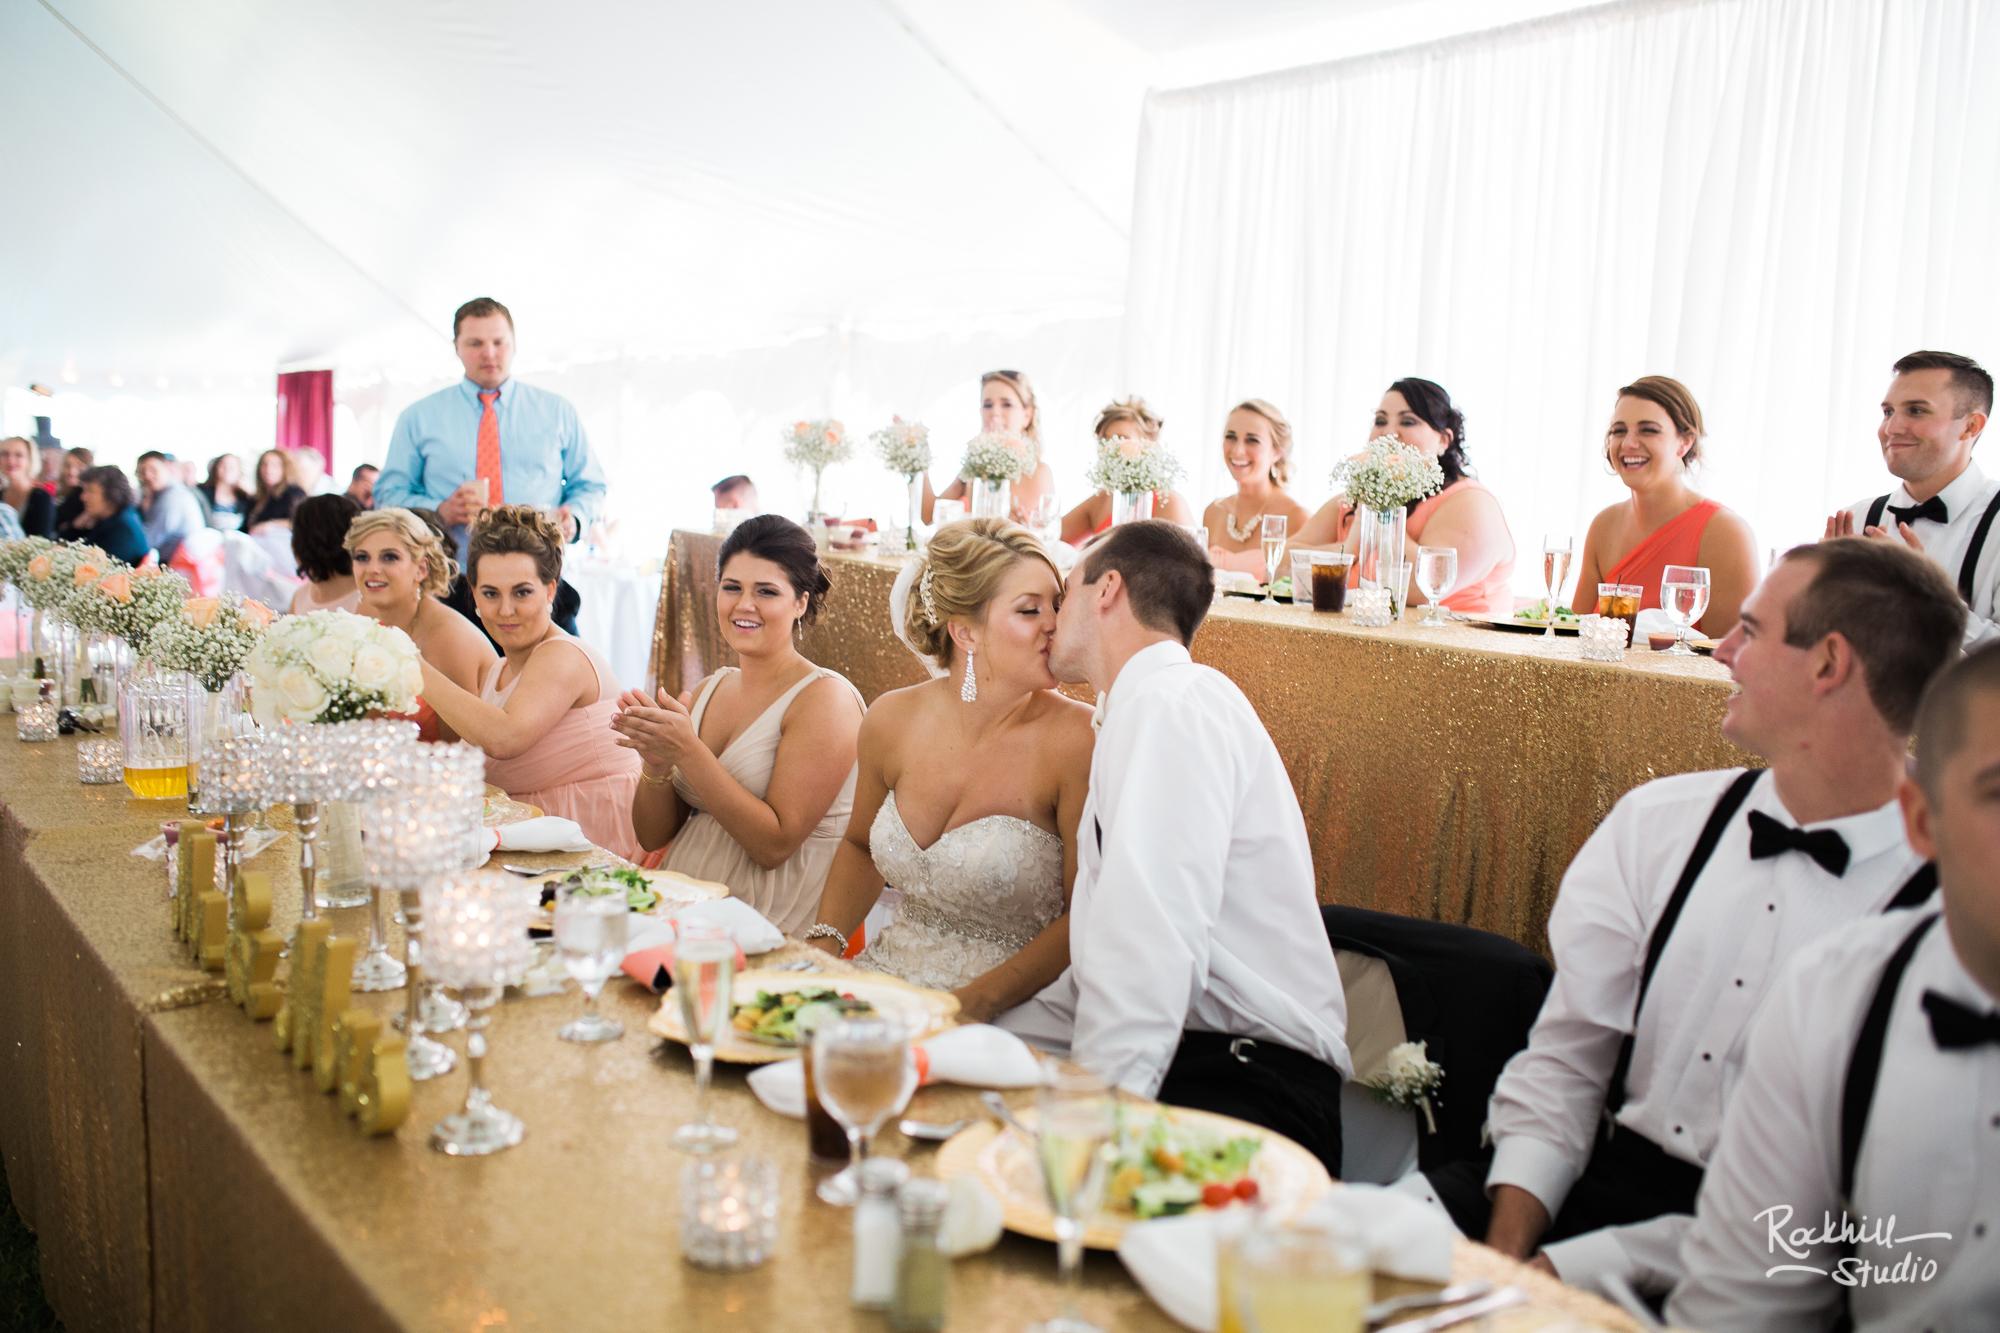 rockhill studio newberry michigan wedding curtis upper peninsula marquette houghton, mackinac island